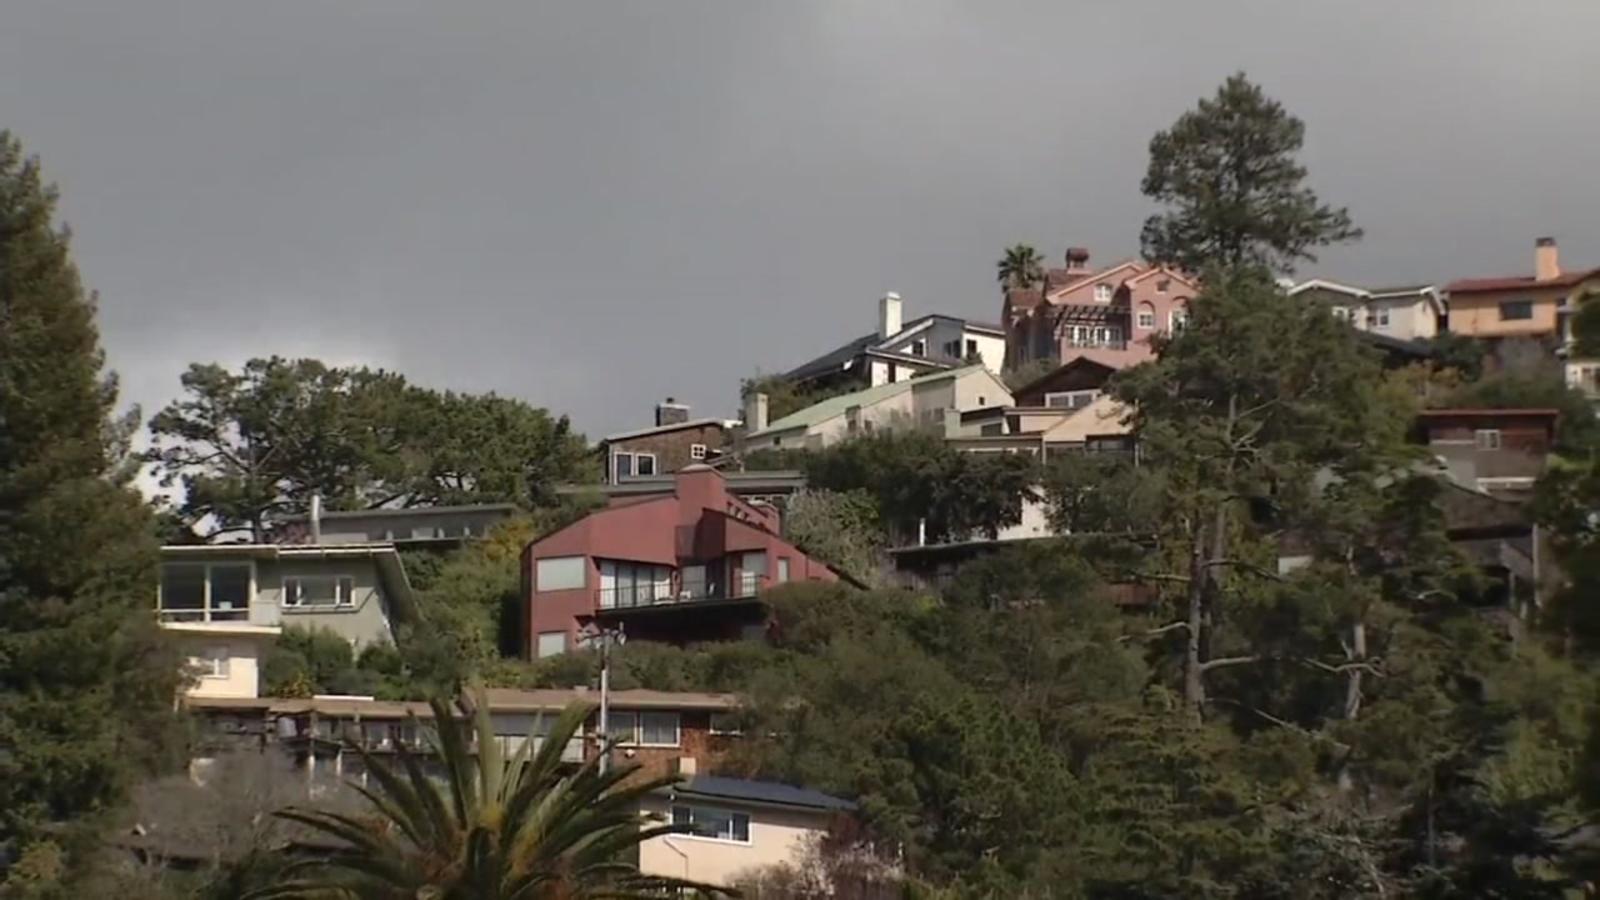 San francisco real estate ipo